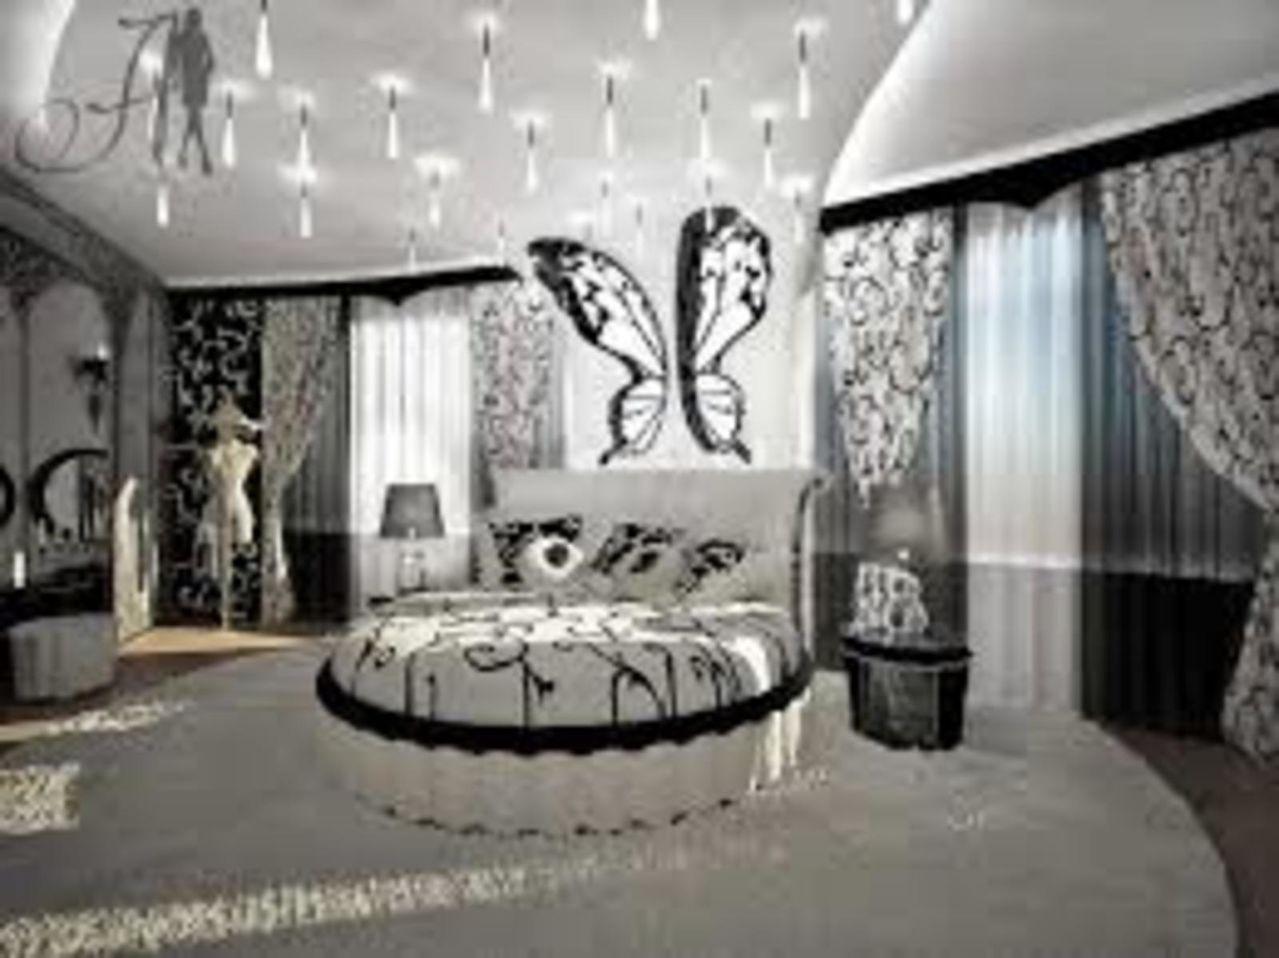 غرف نوم مودرن ديكورات غرف نوم صور غرف نوم 2020 25